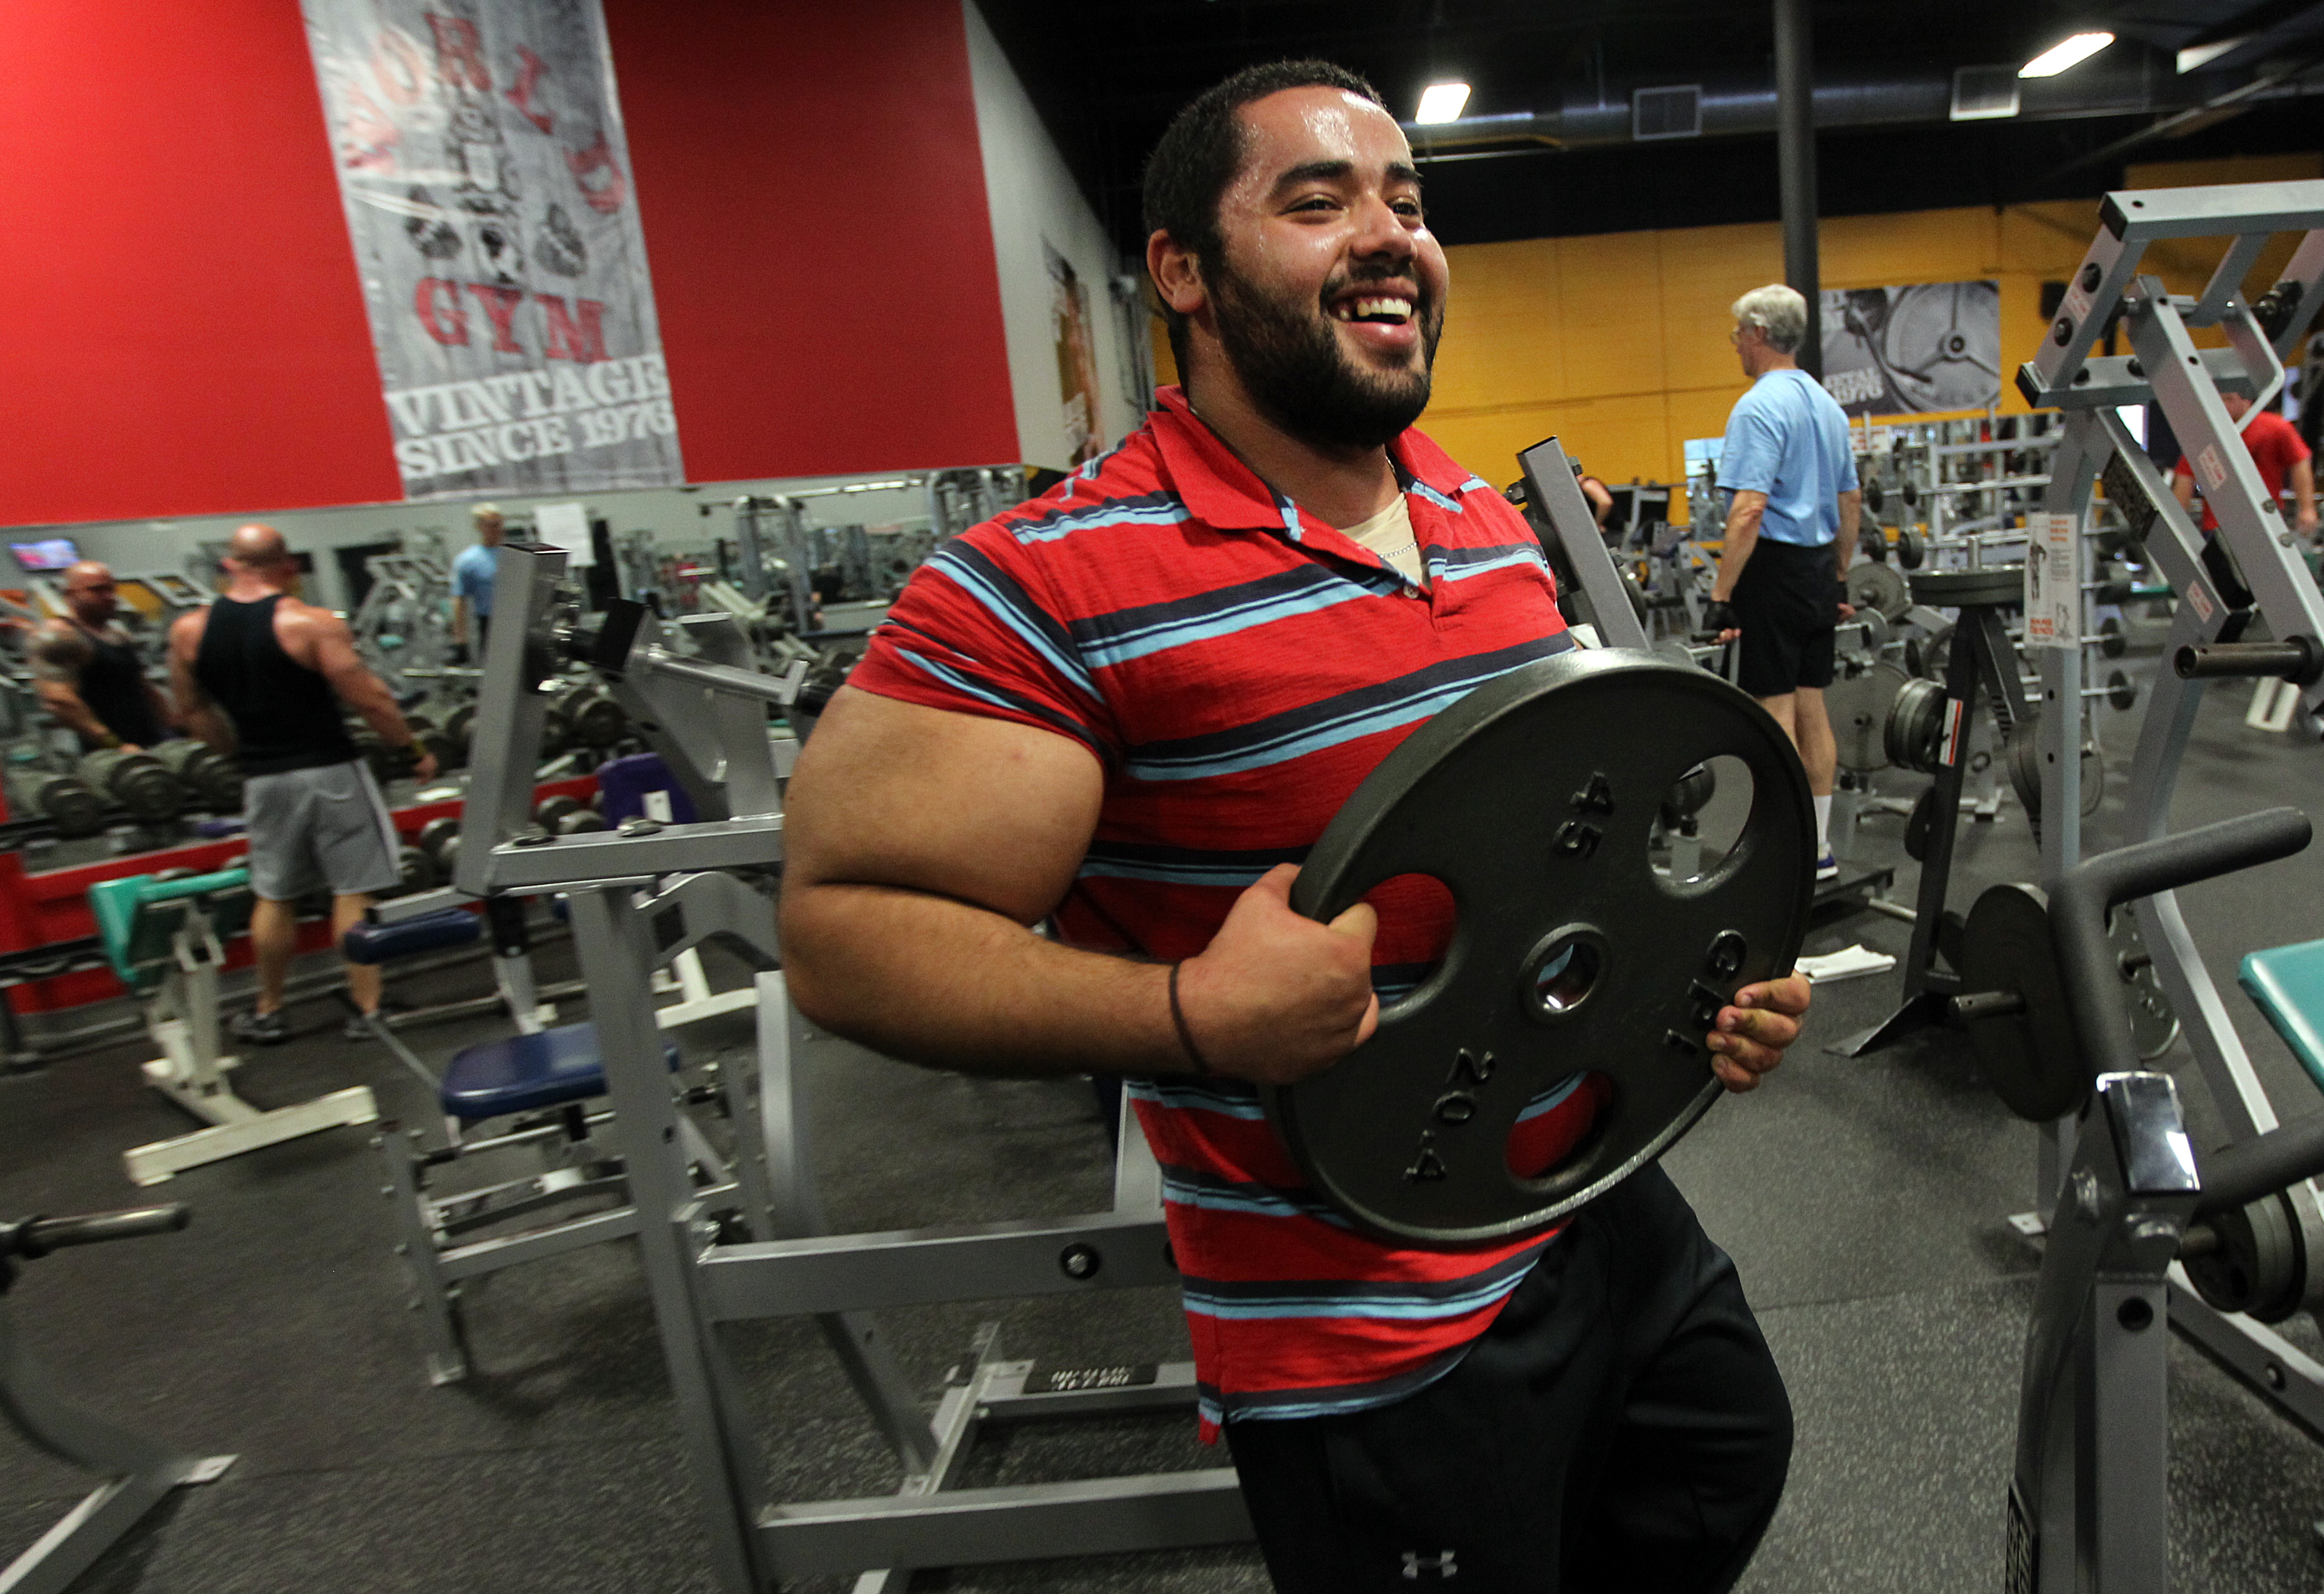 Guinness hails Franklin man's 31-inch biceps - The Boston Globe